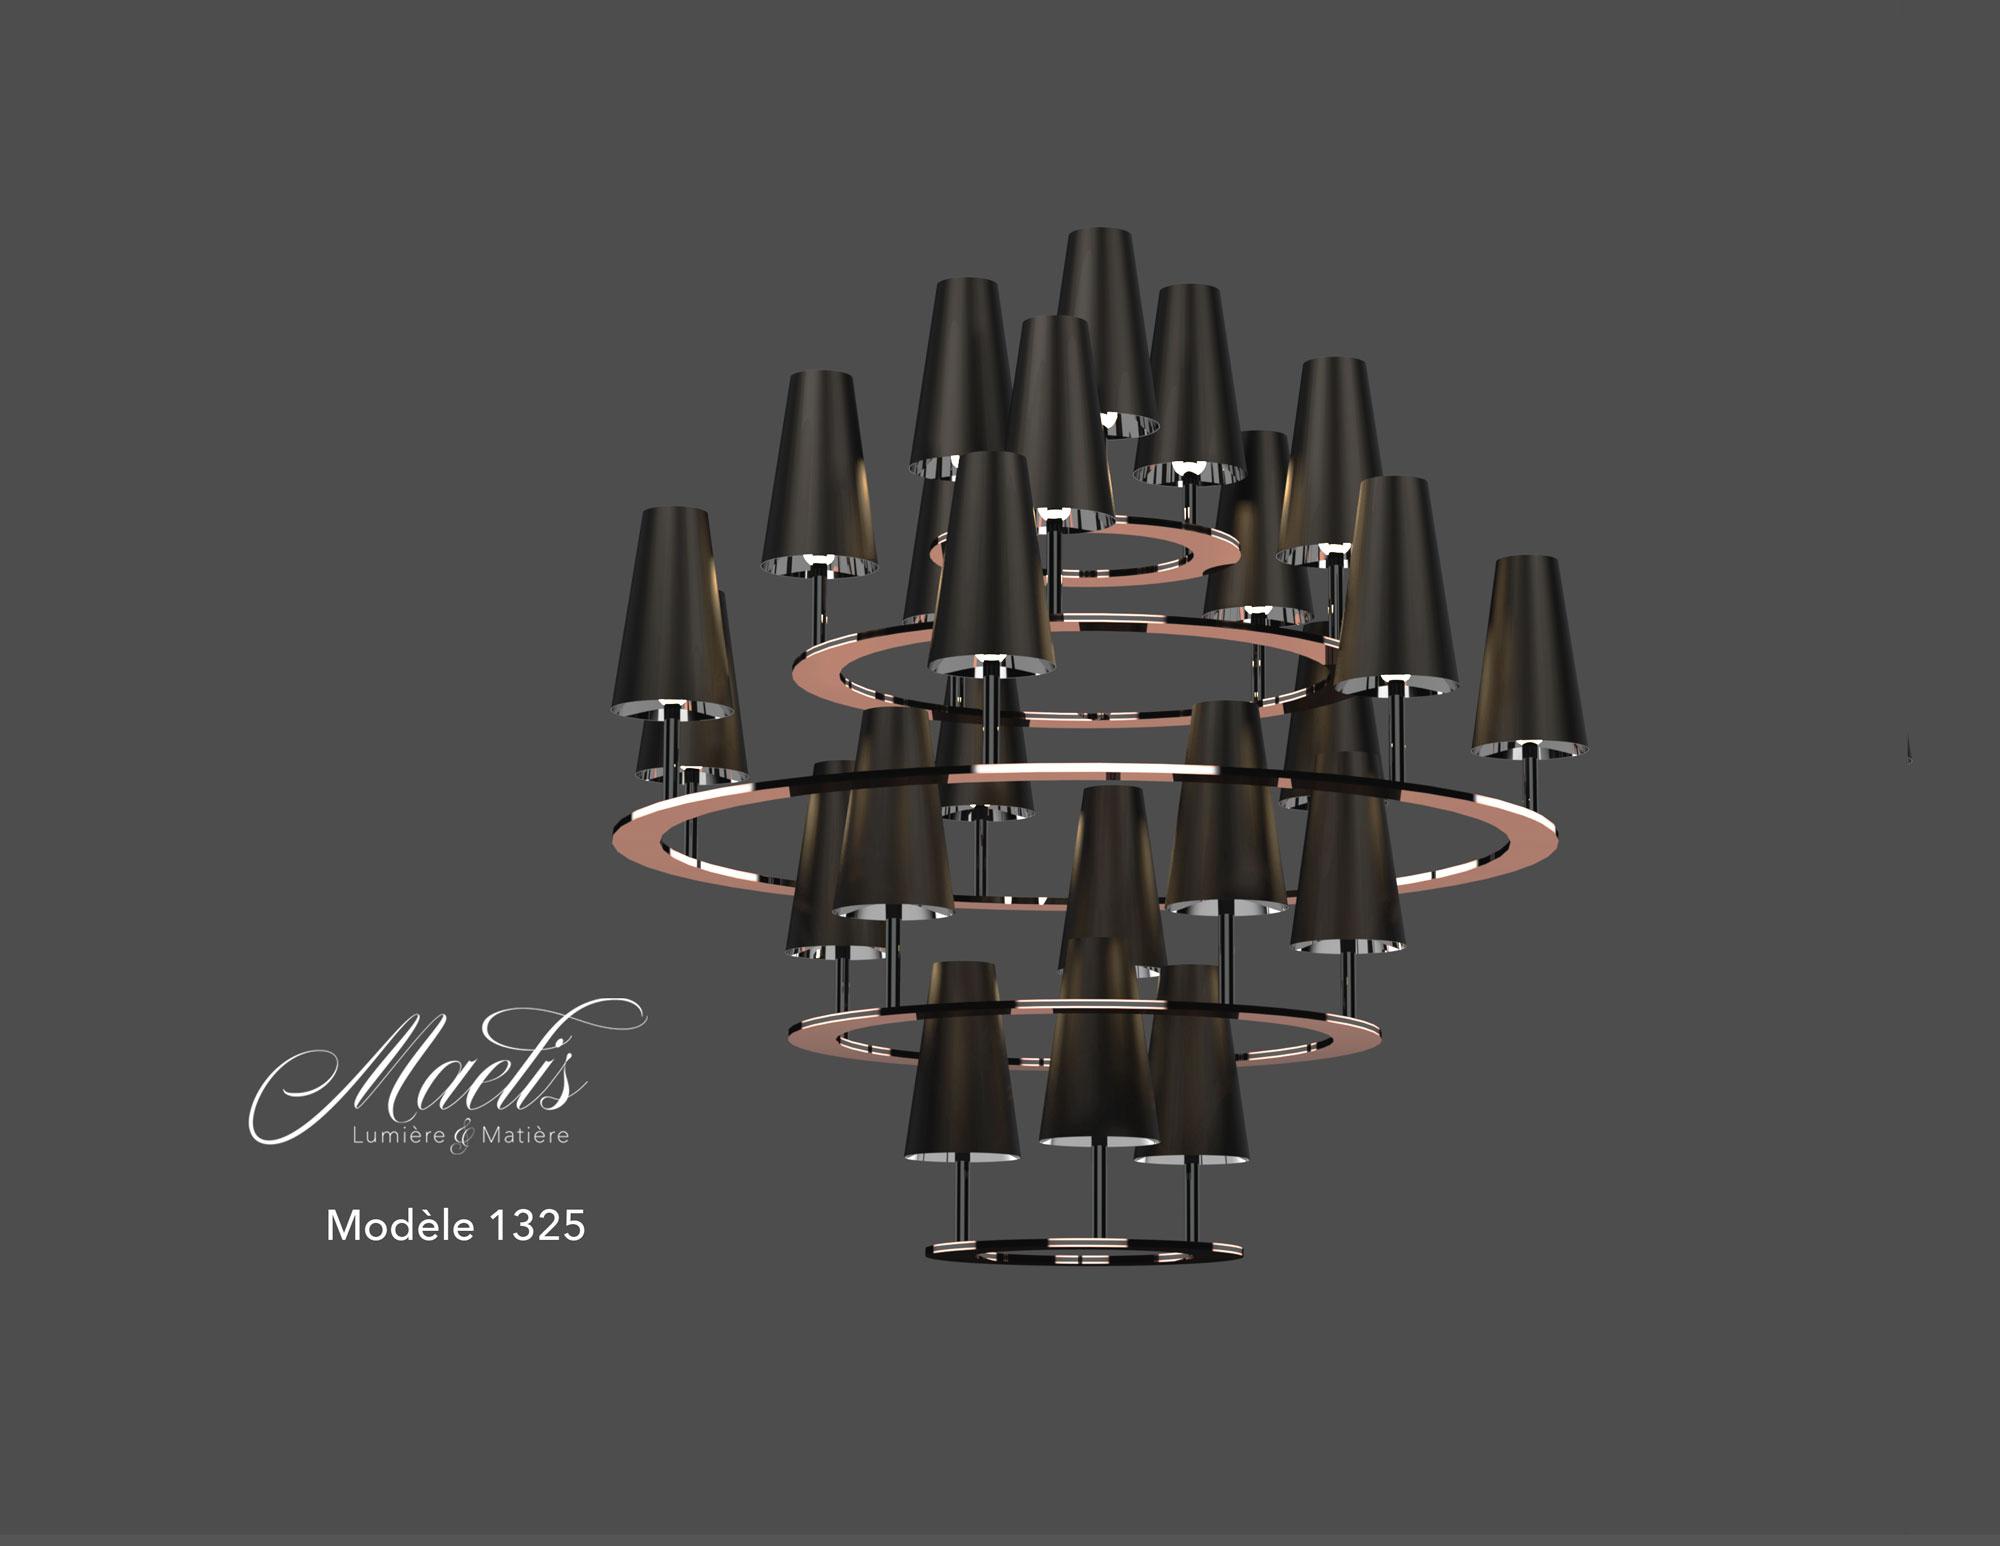 Maelis_Modèle_1325_img